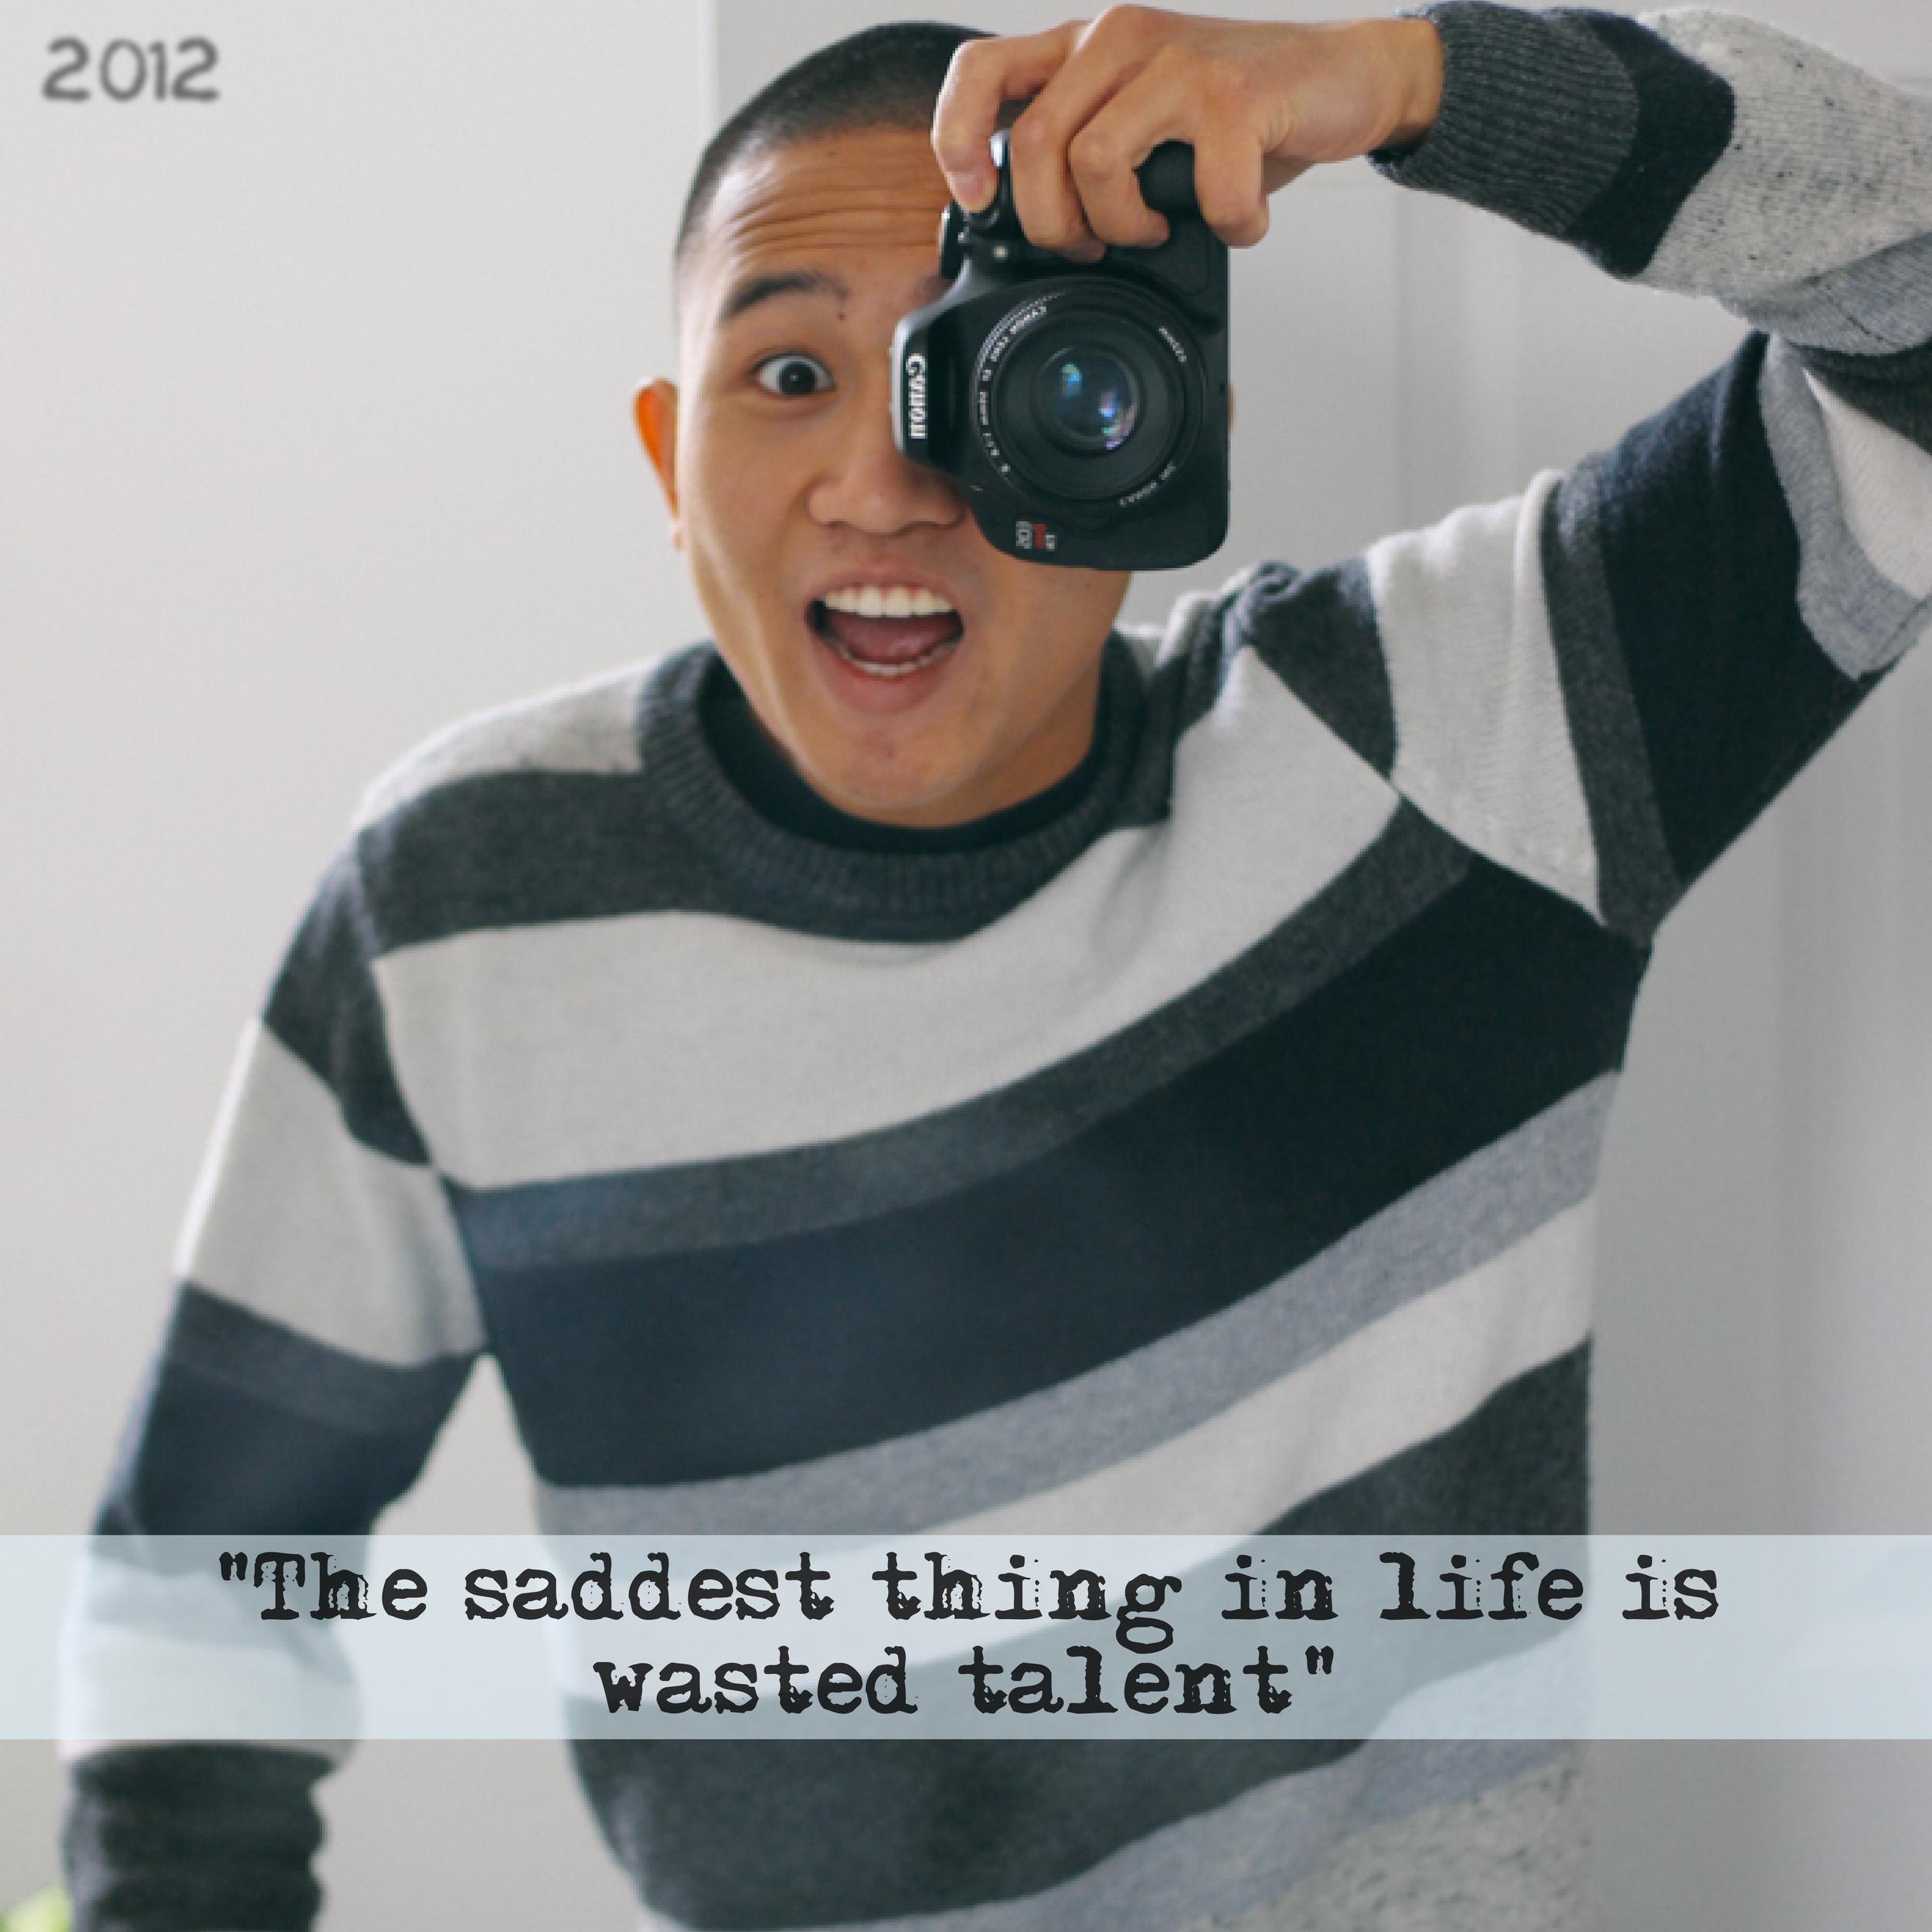 Reflecting on Undergrad - Talent.jpg